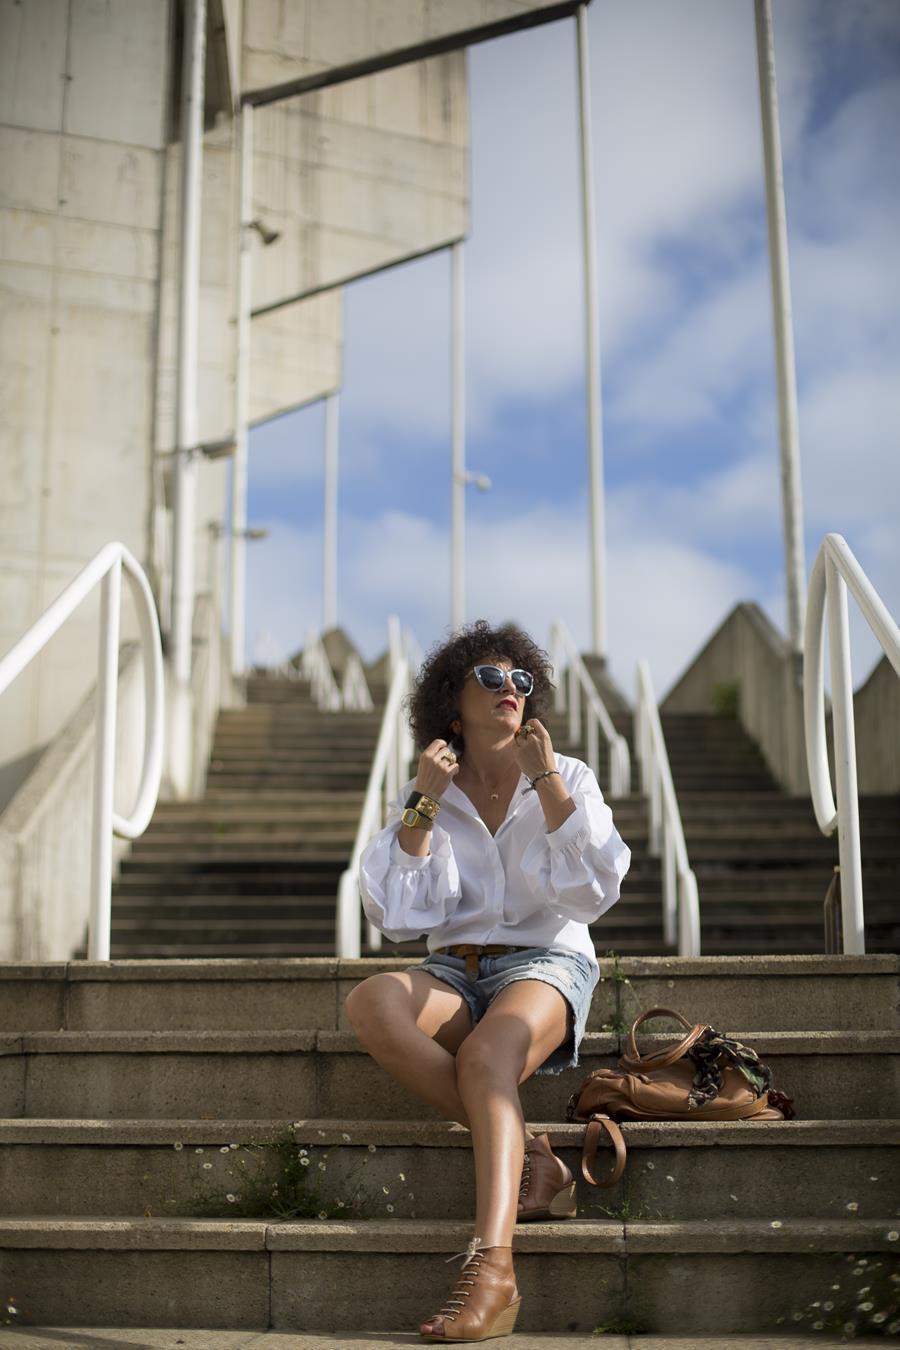 Rebeca Valdivia, Miss Clov, personal shopper, Donostia, San Sebastián, curlpower, curls, sandalia abotinadas, sandals, denim short, leather bag, white shirt, frills, camisa blanca, maxi pendientes, pendientes piña, maxi earings